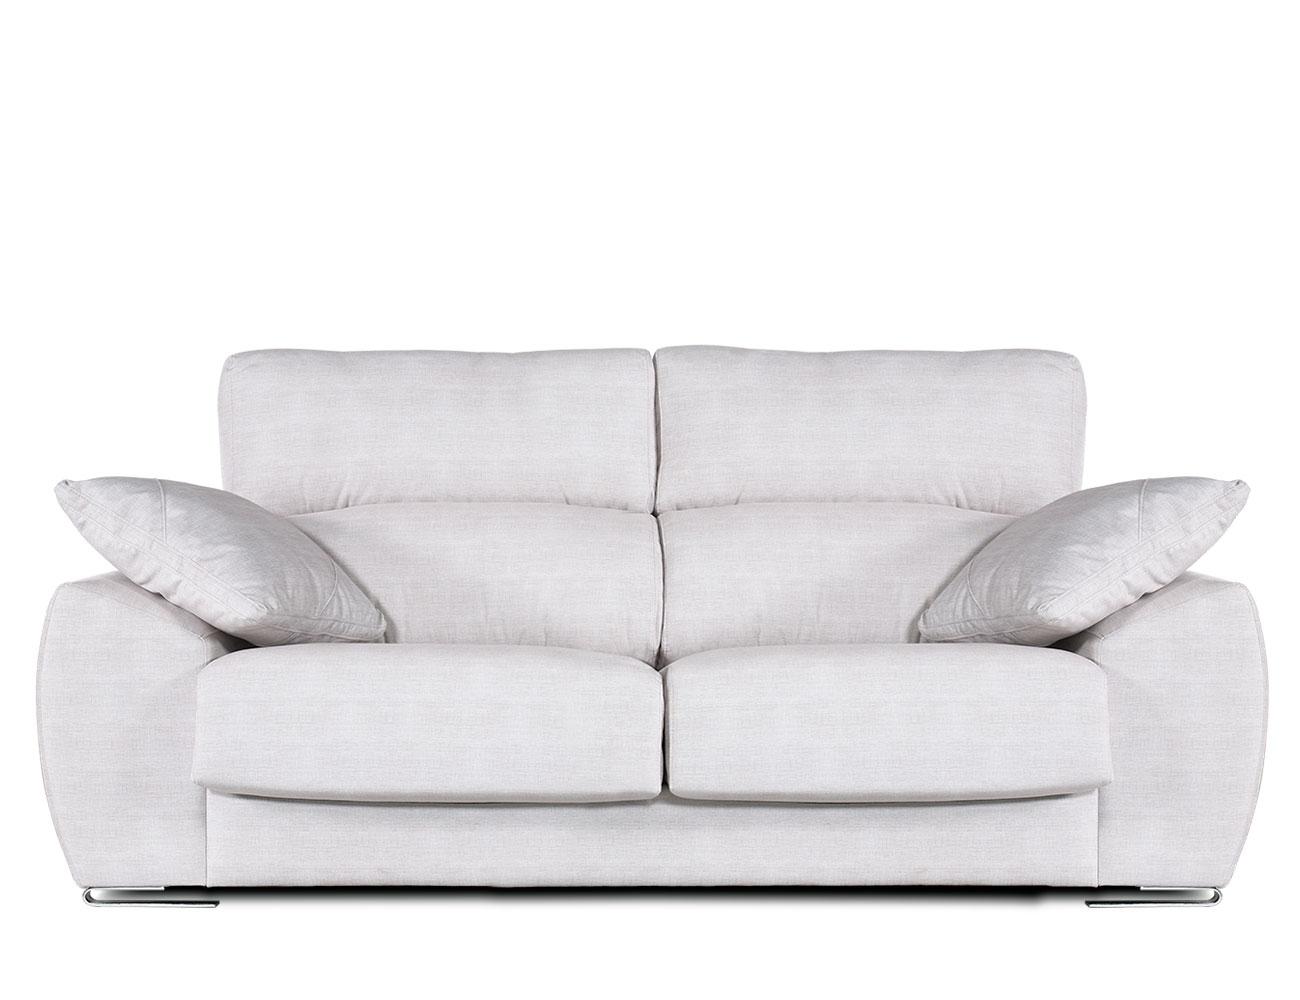 Sofa moderno 3plazas8